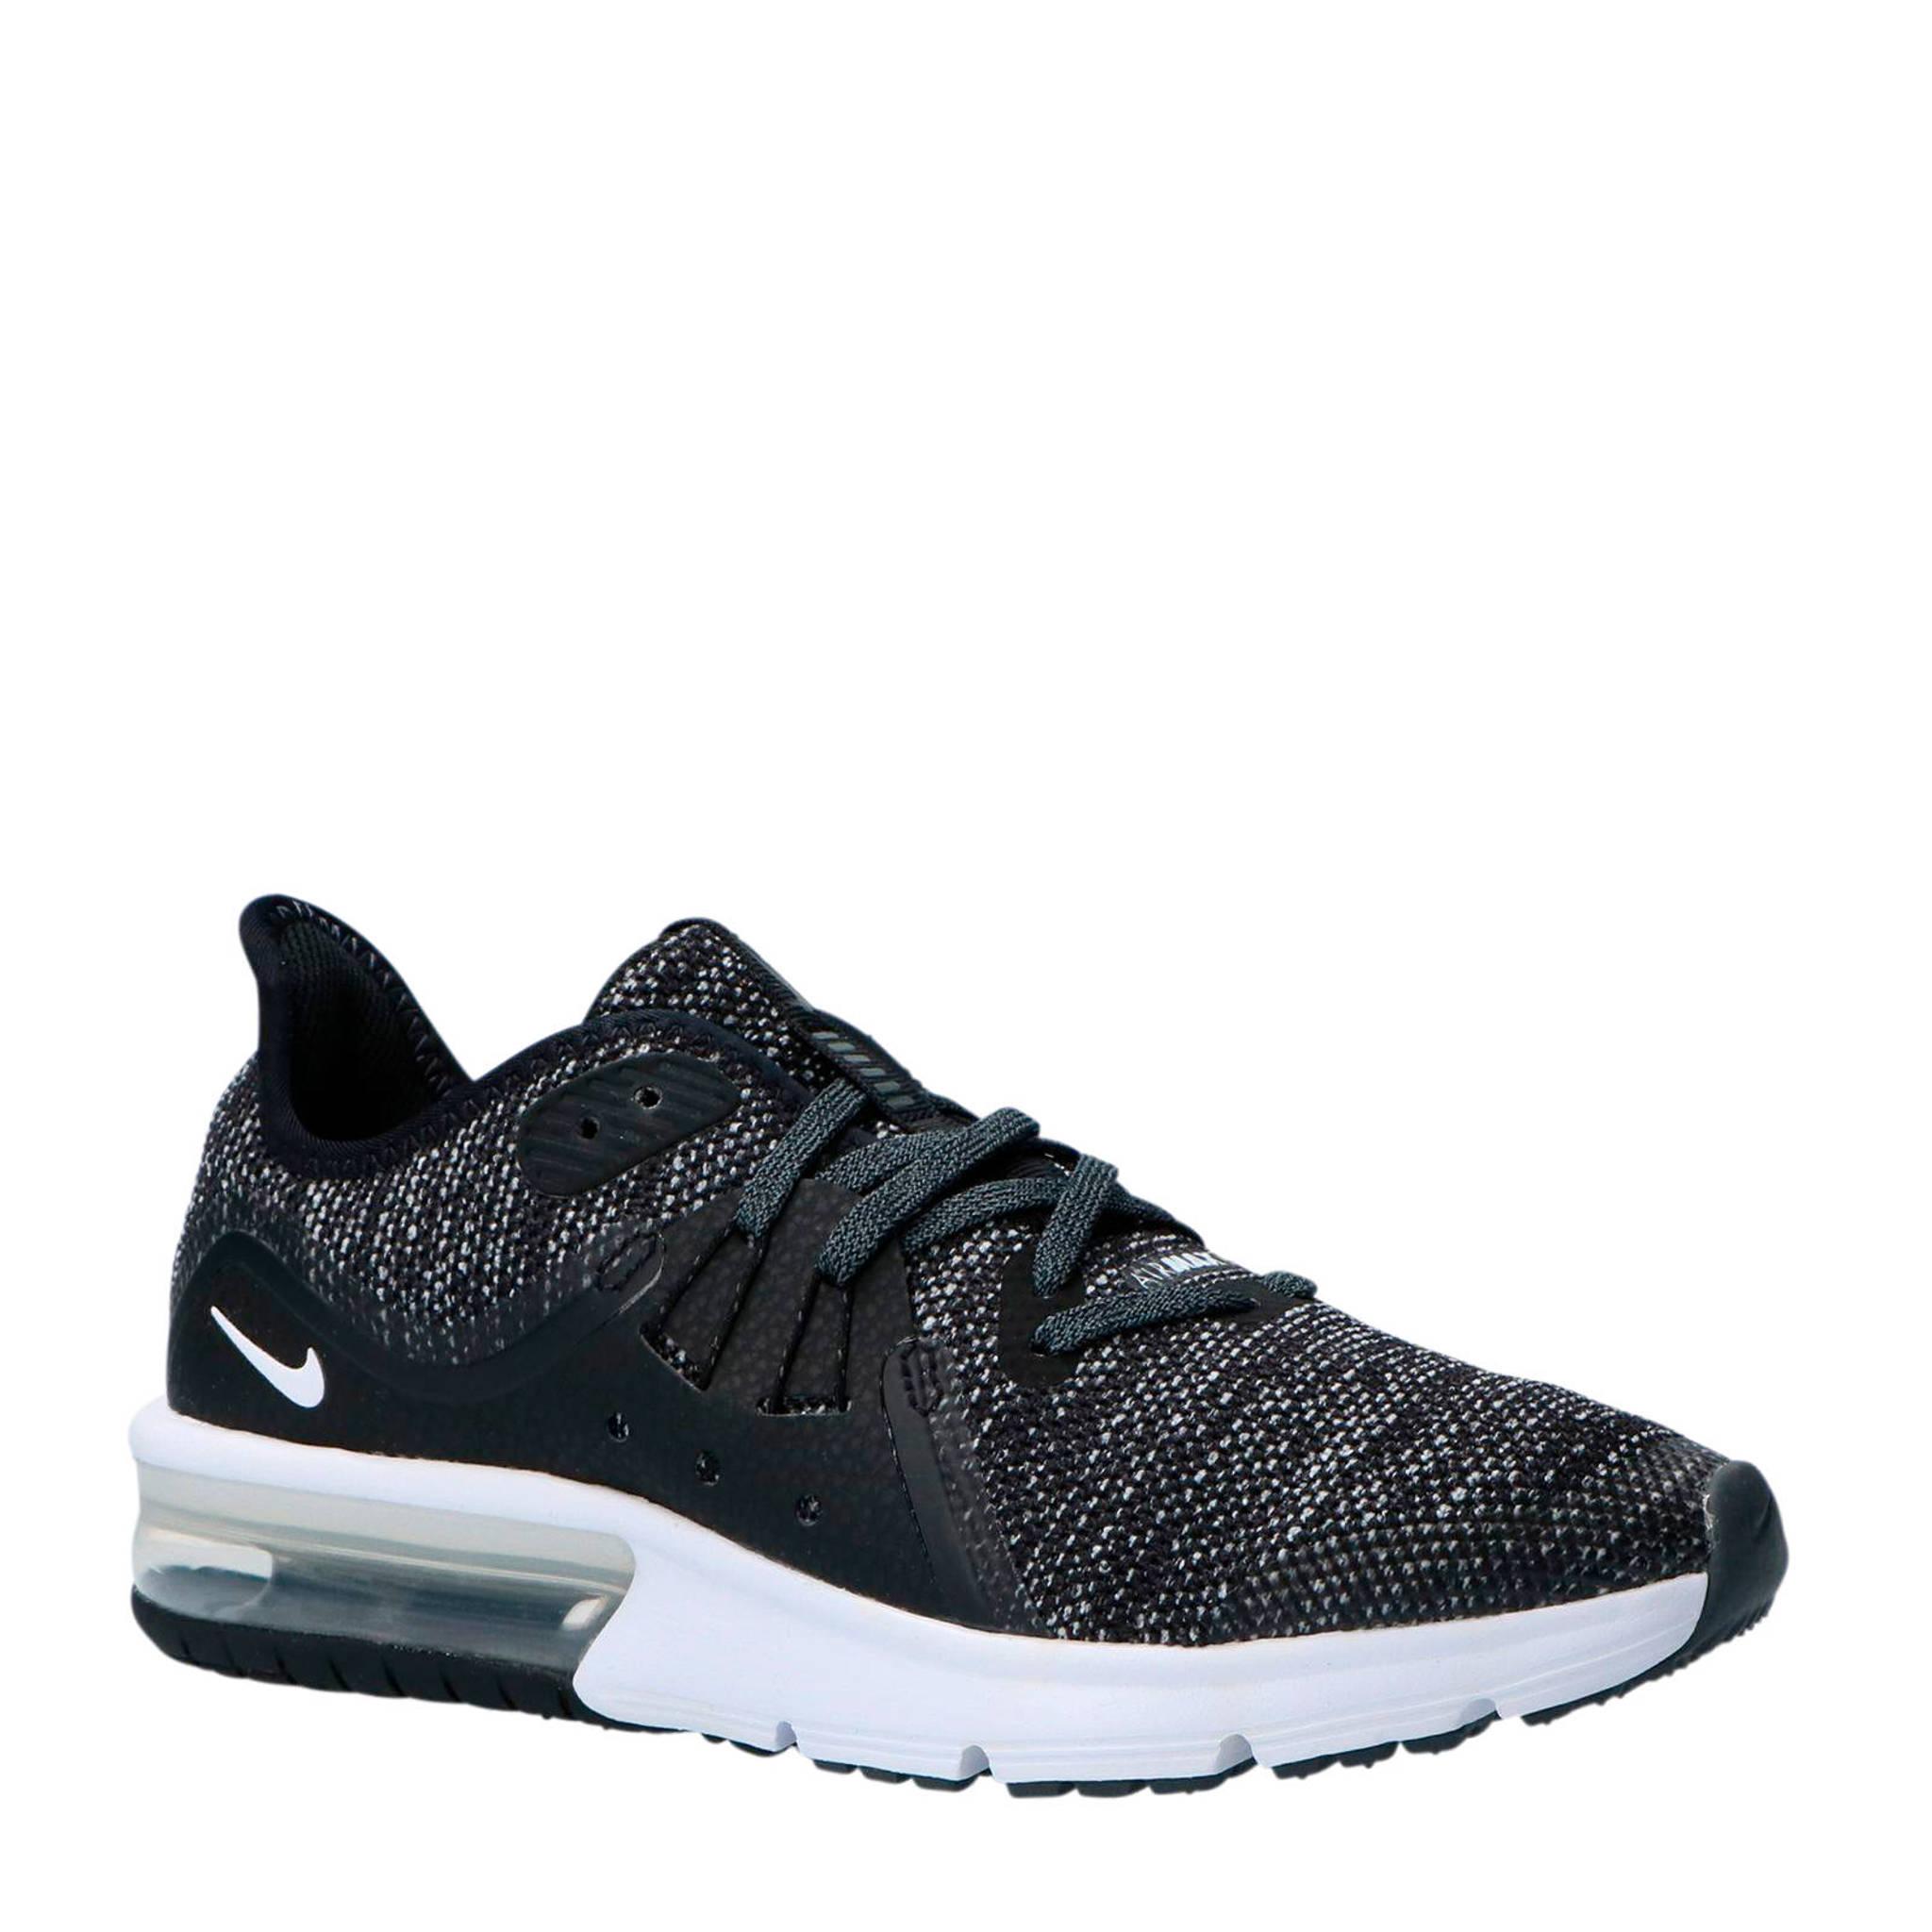 8b87e8990ea Nike Air Max Sequent 3 (GS) zwart/wit   wehkamp